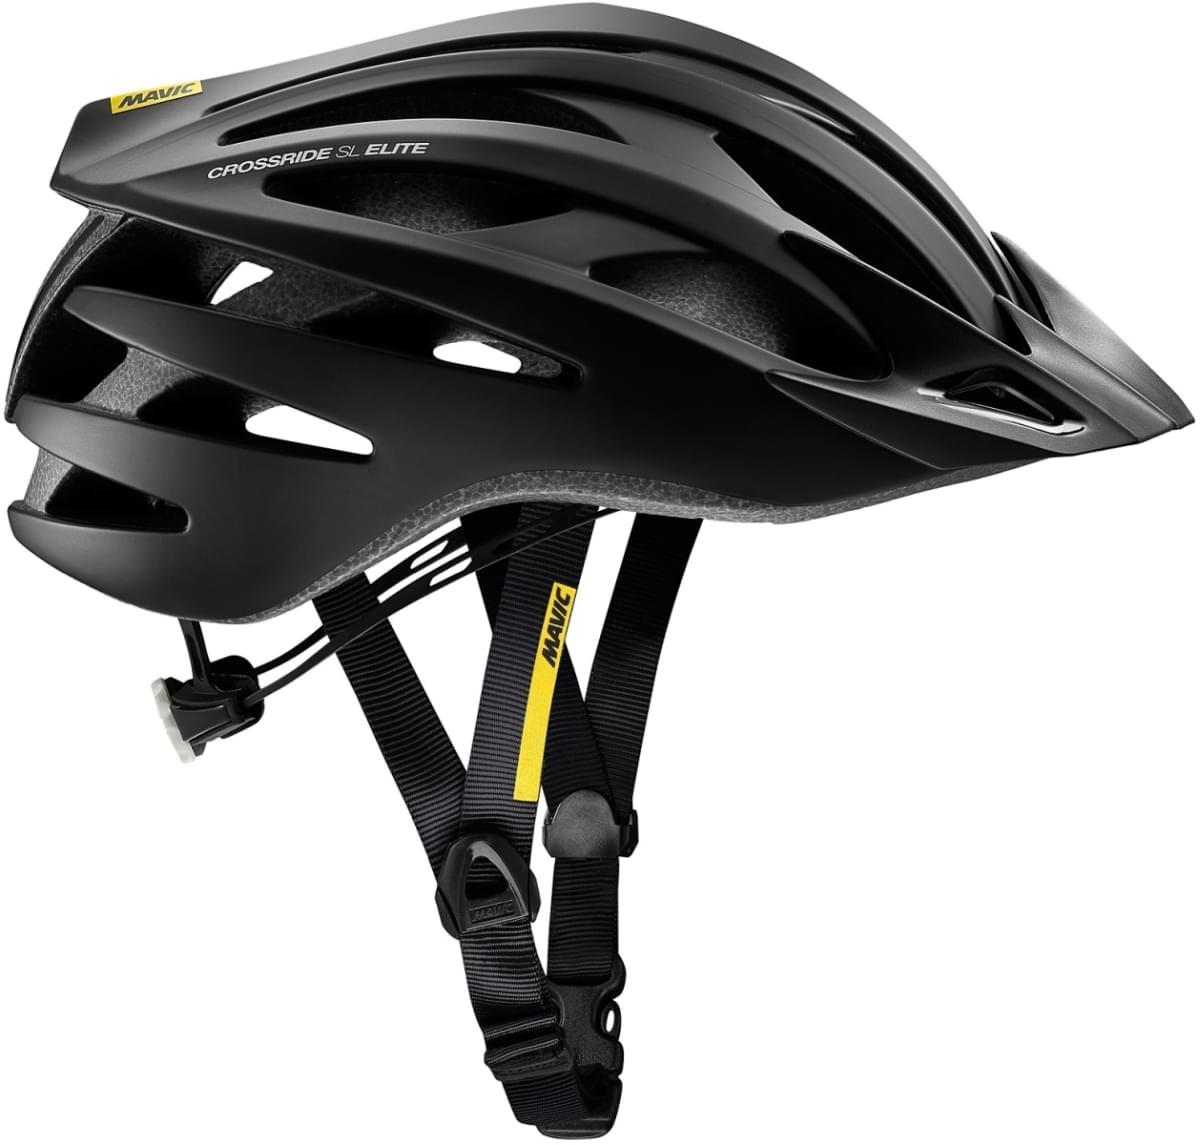 Mavic Crossride Sl Elite Helmet - black/white M